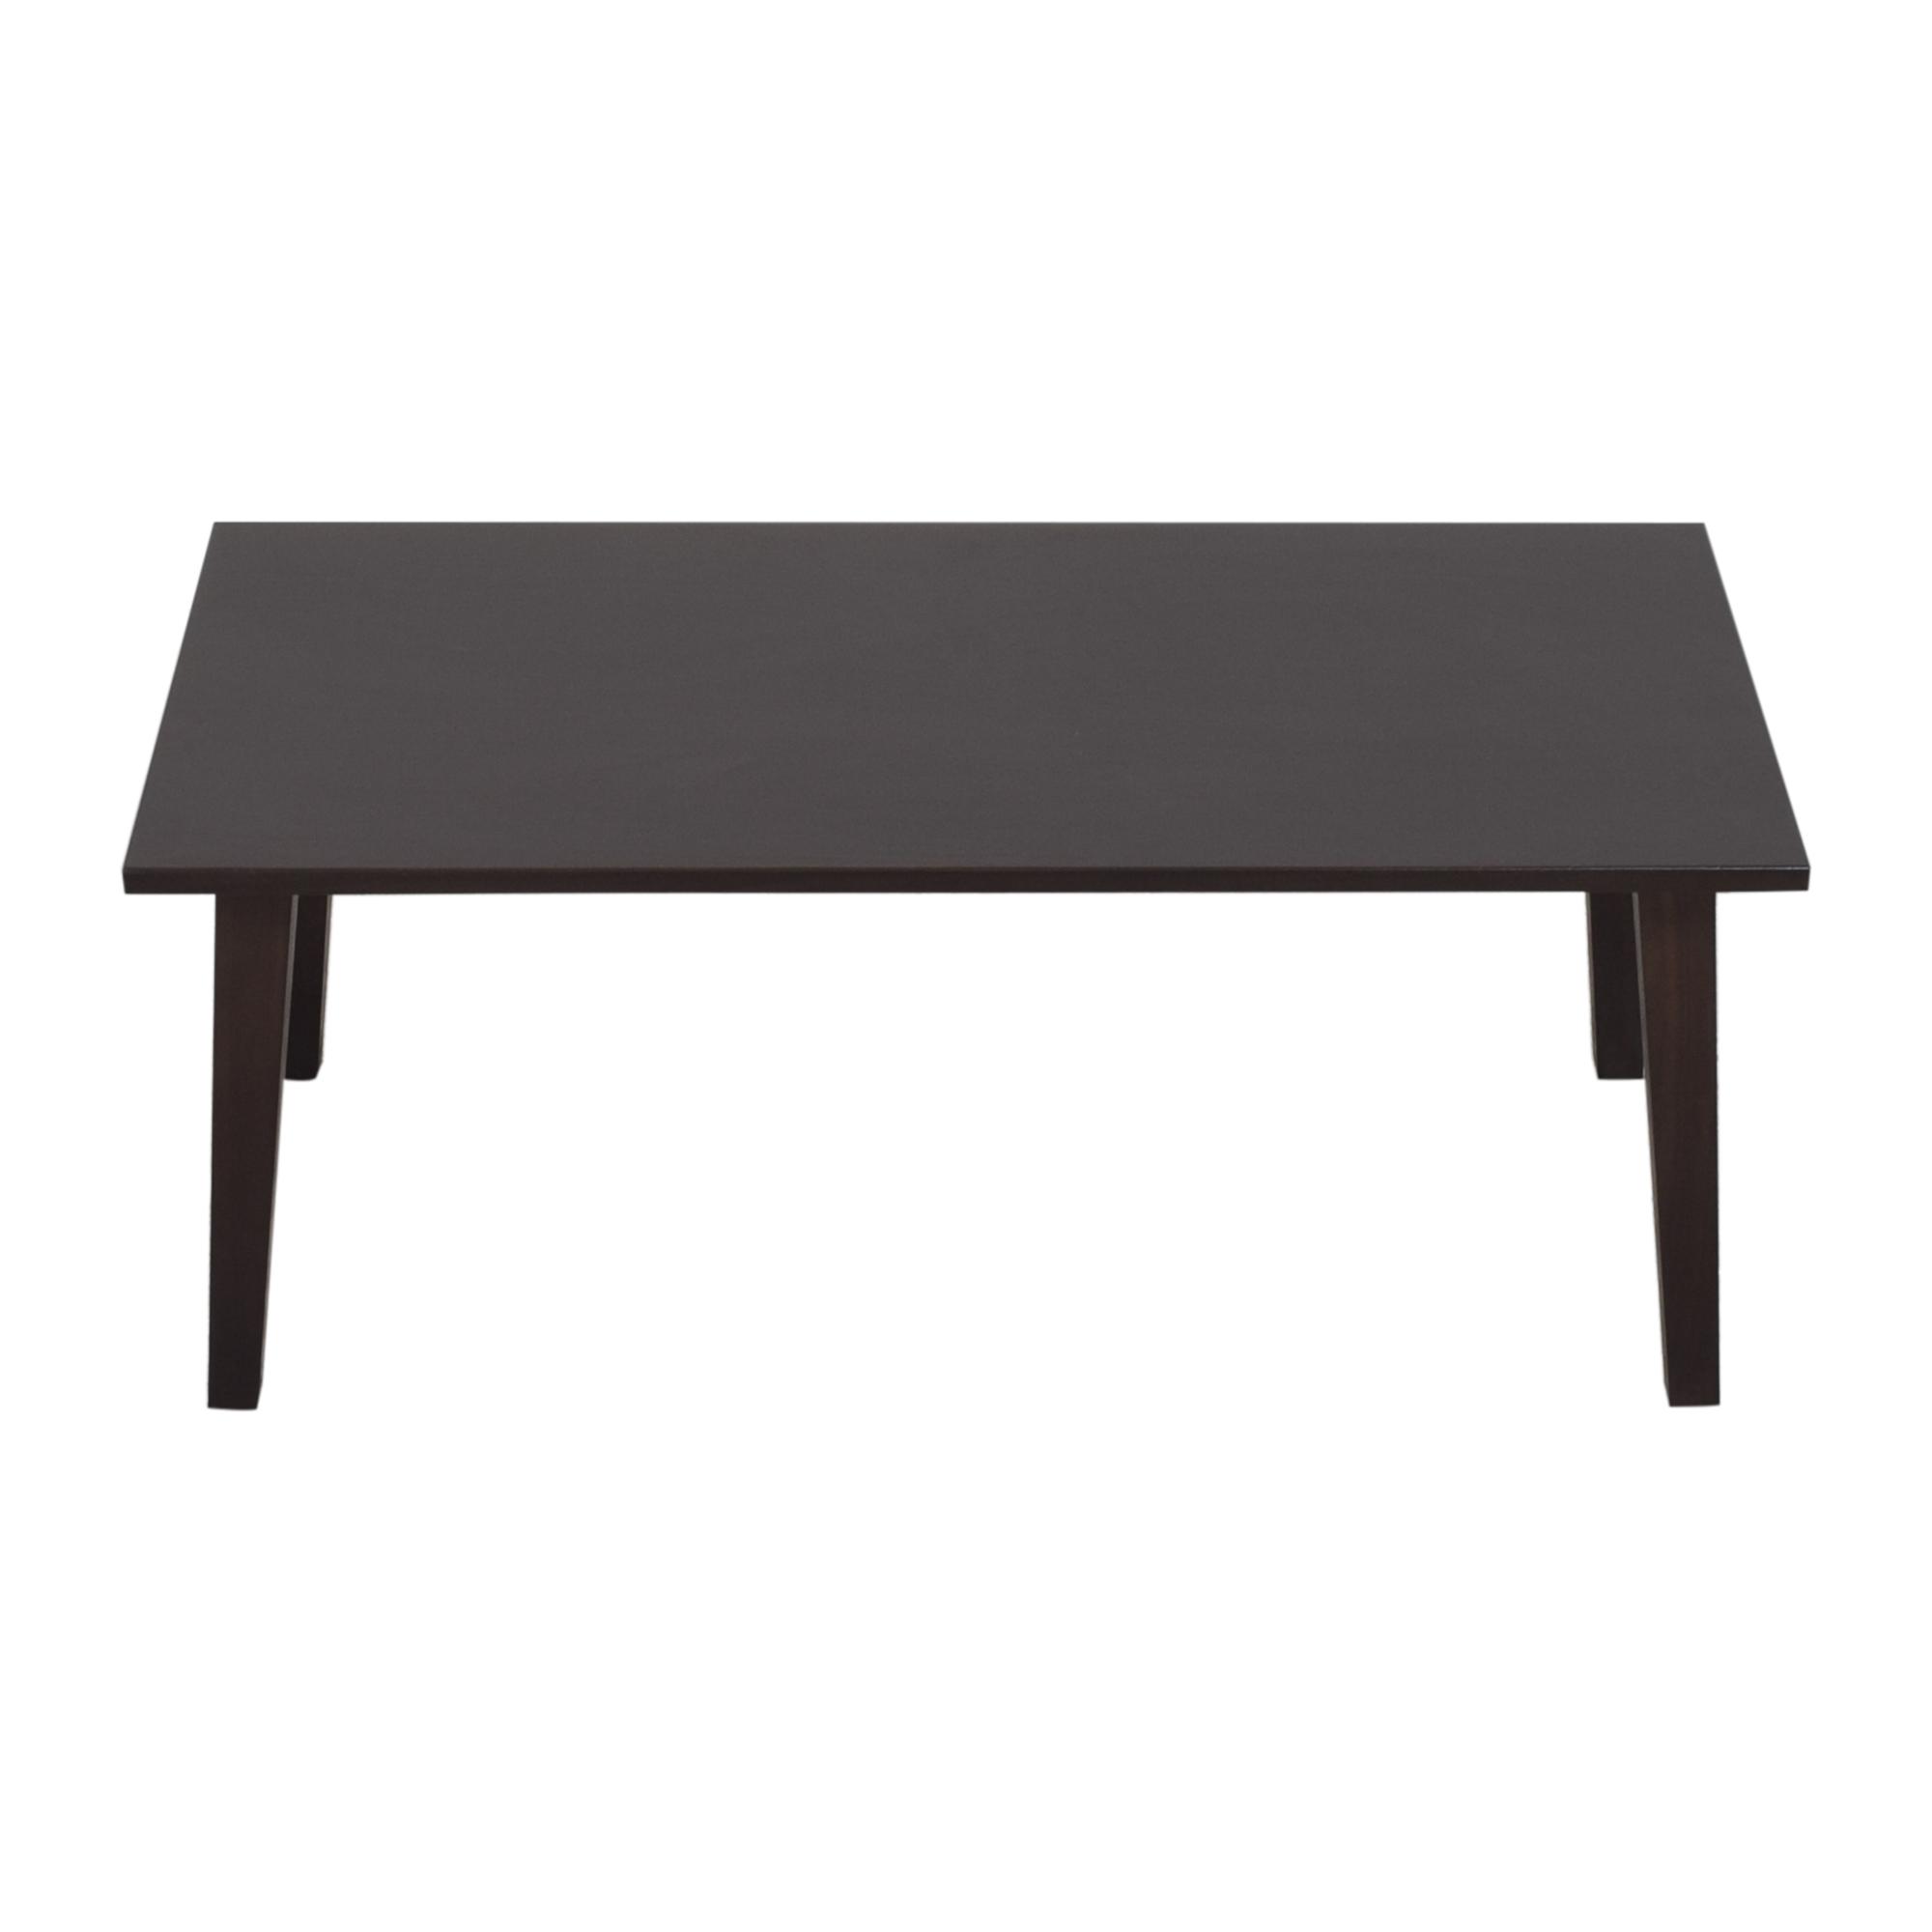 Global Furniture Group Corby Veneer Coffee Table / Coffee Tables